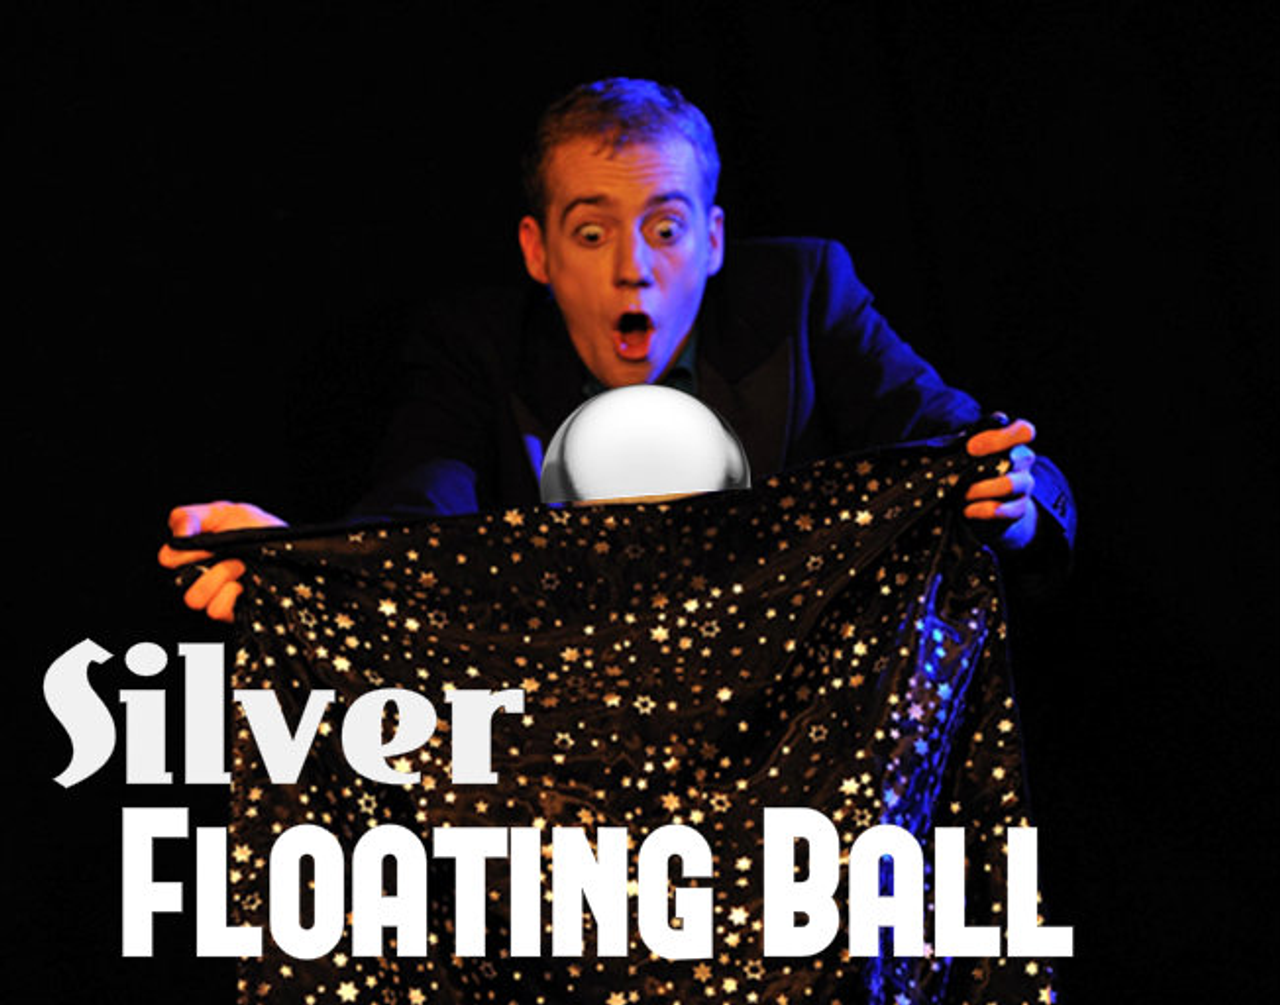 Zombie Ball Floating Levitation Magic Trick Gospel